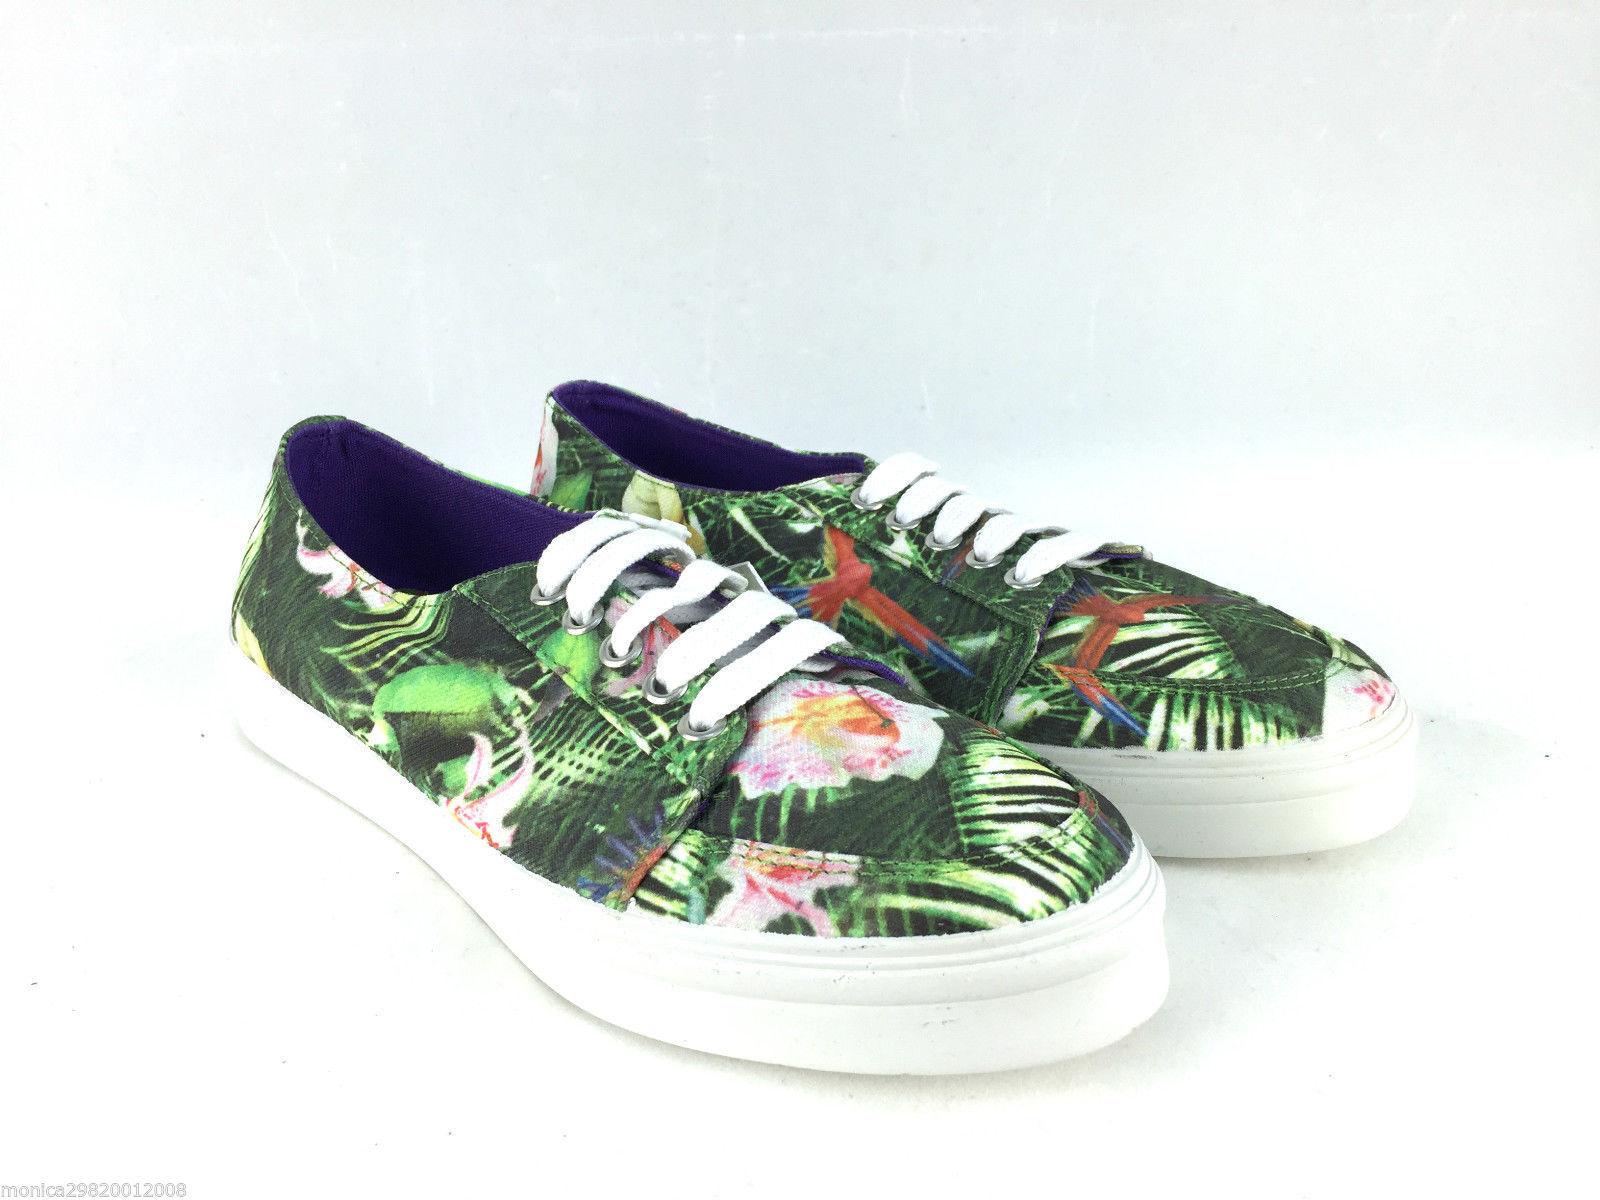 Zara Mujer EUR38 Floral Zapatos Talla UK5 EUR38 Mujer Us7.5 e68cbb